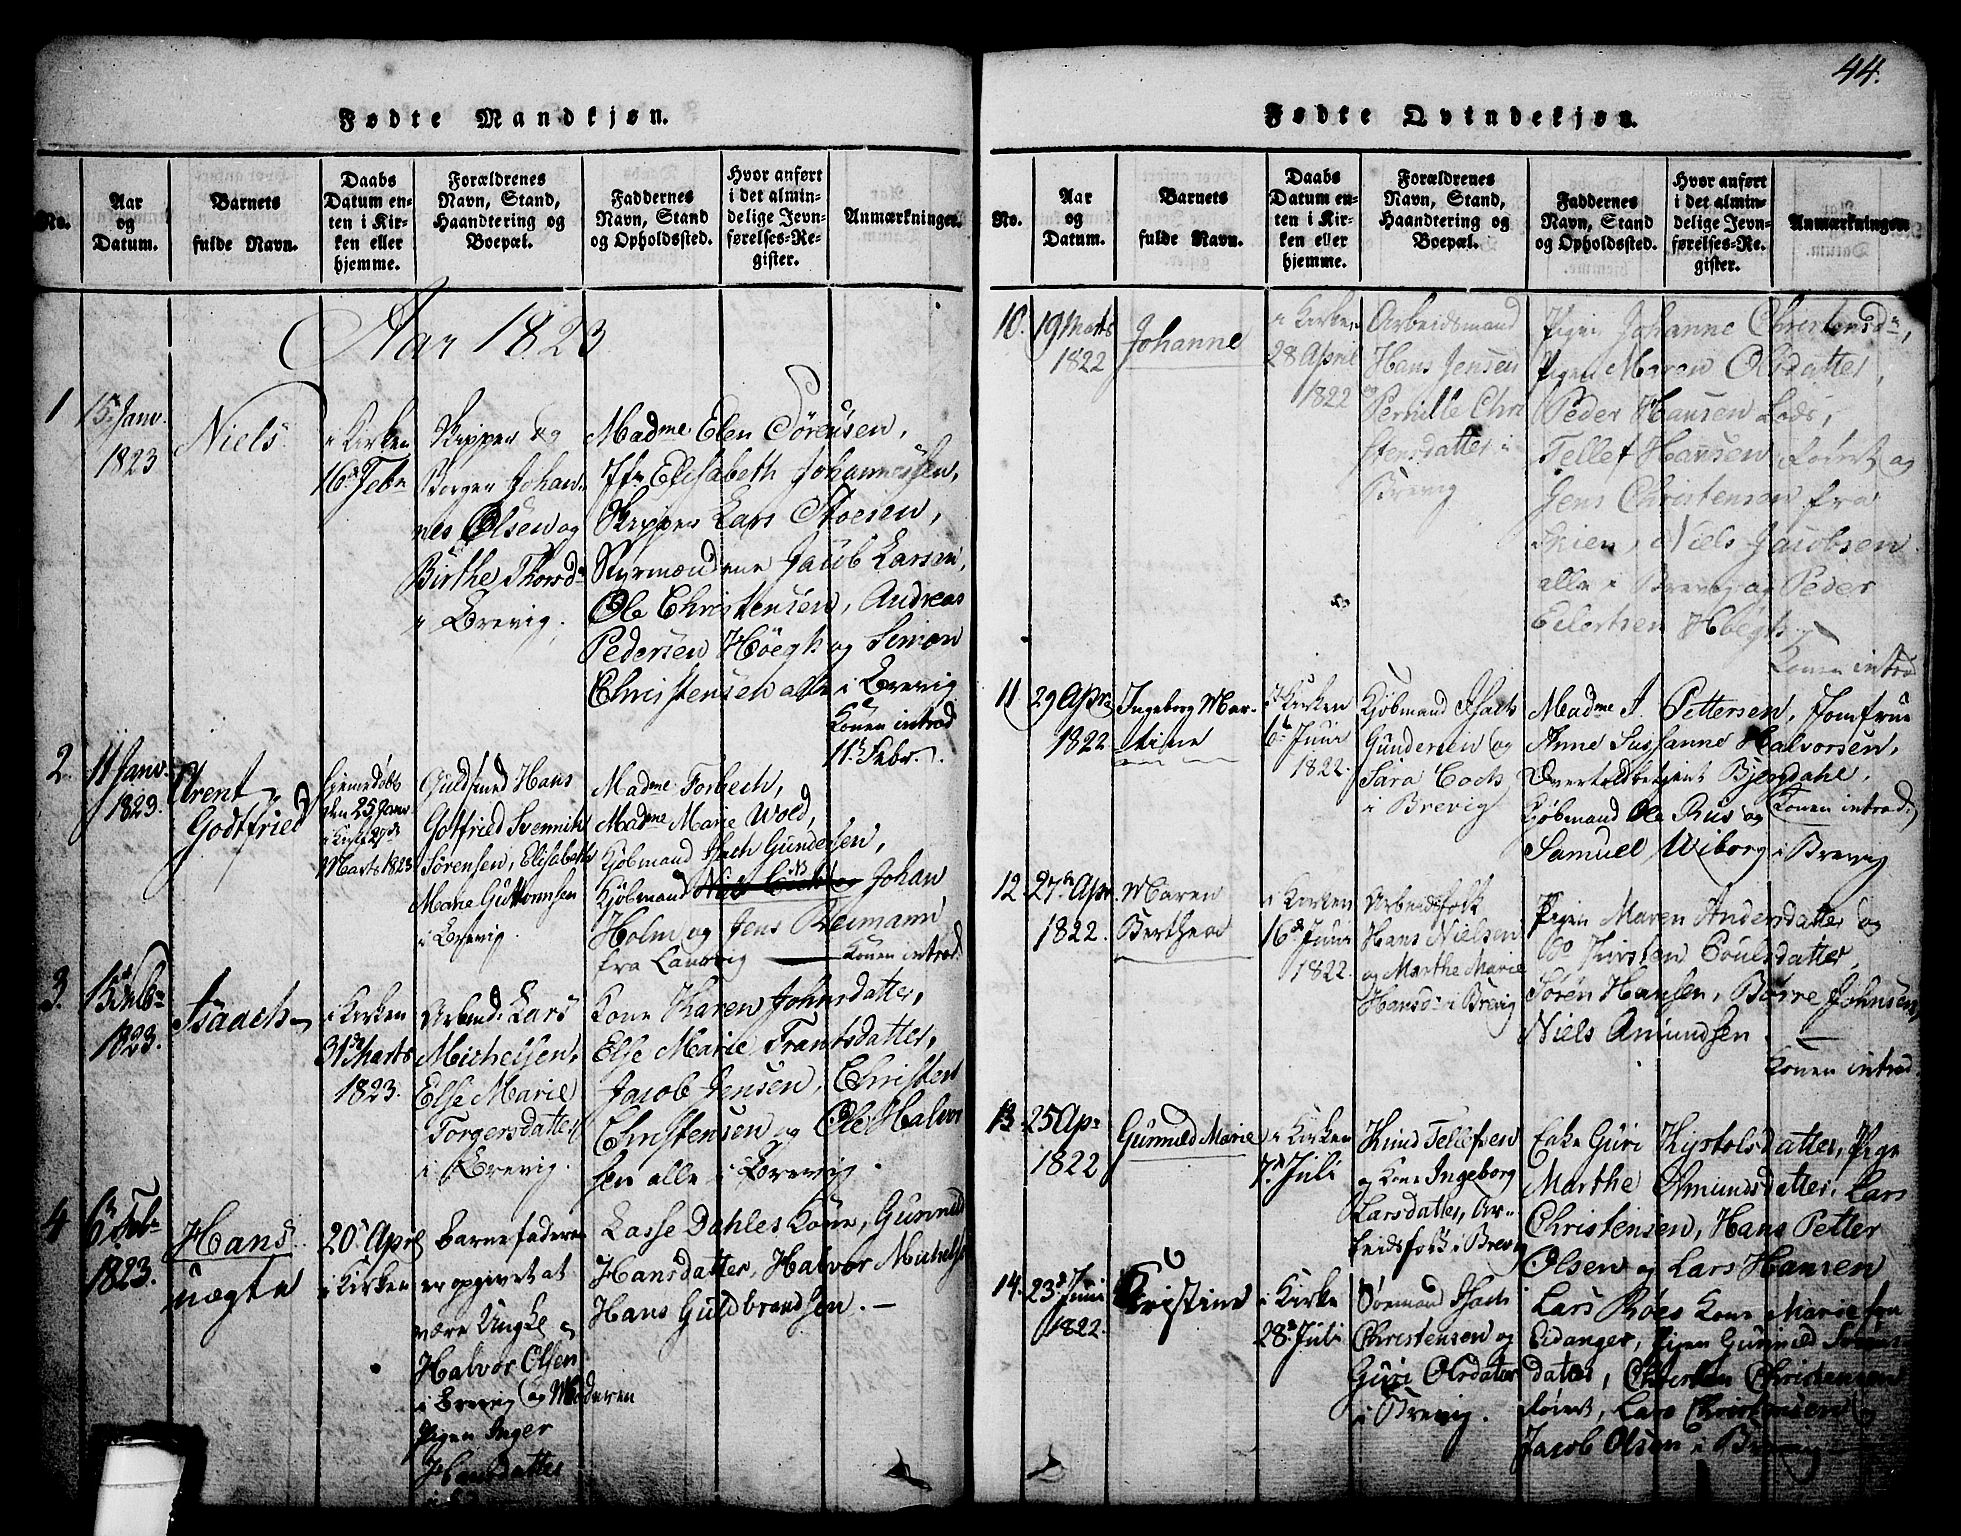 SAKO, Brevik kirkebøker, G/Ga/L0001: Klokkerbok nr. 1, 1814-1845, s. 44